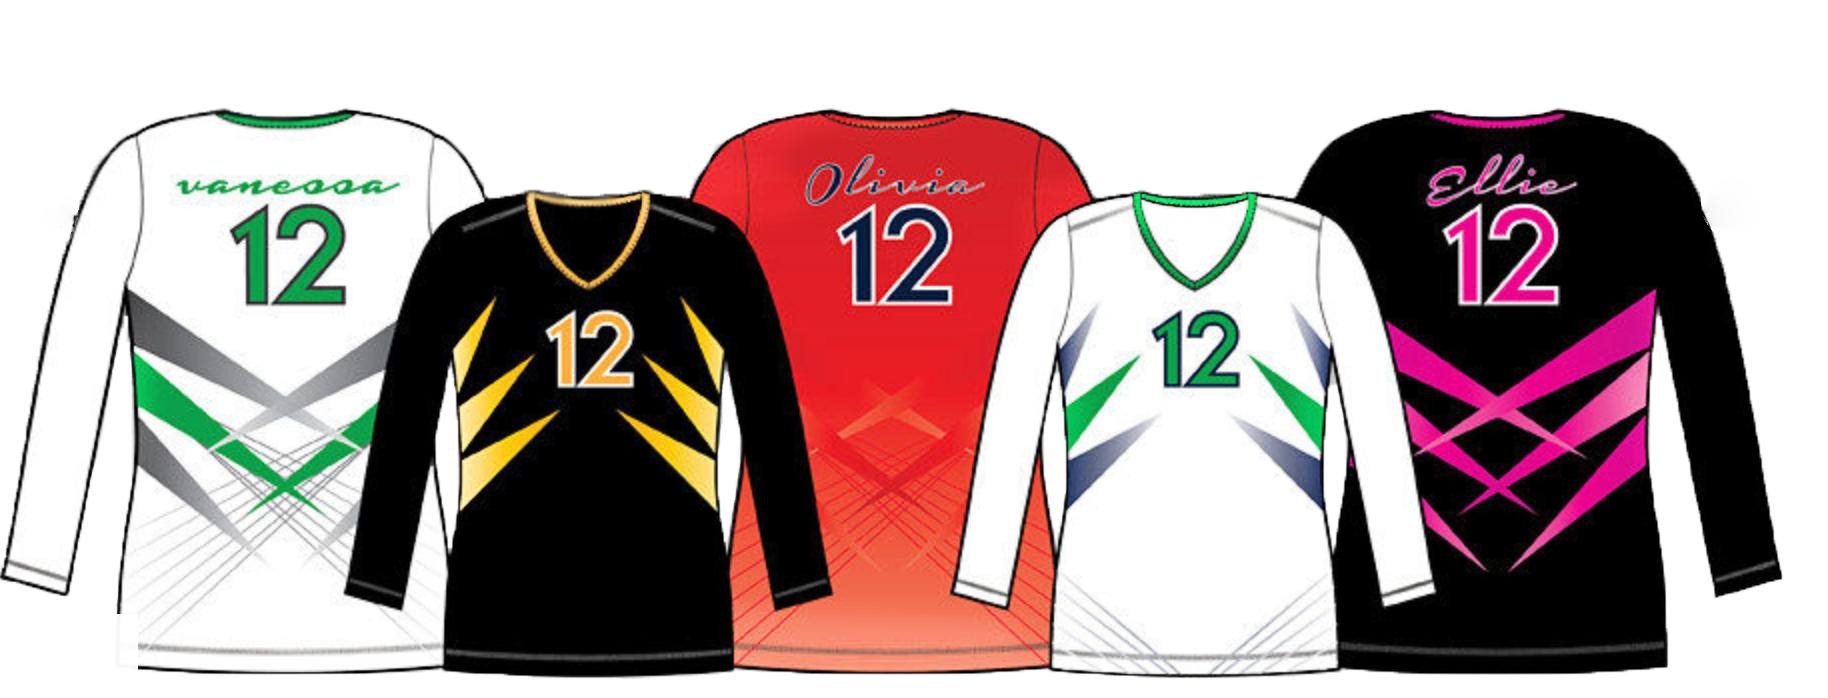 Custom Uniform Concept